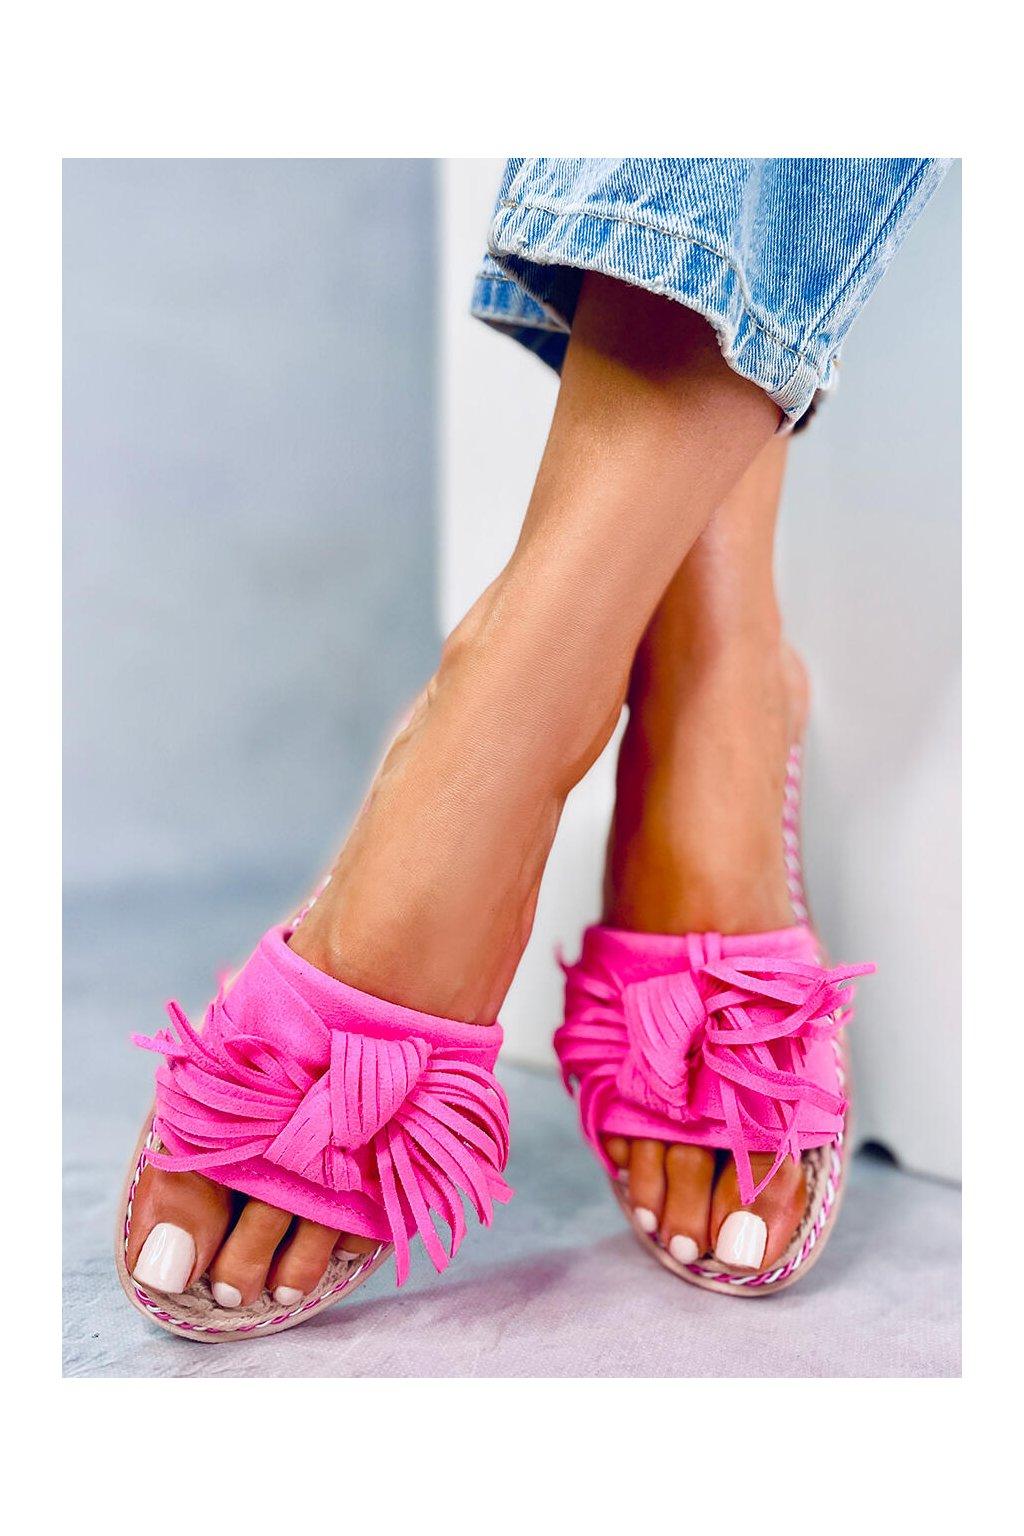 Damske šľapky ružové CK159